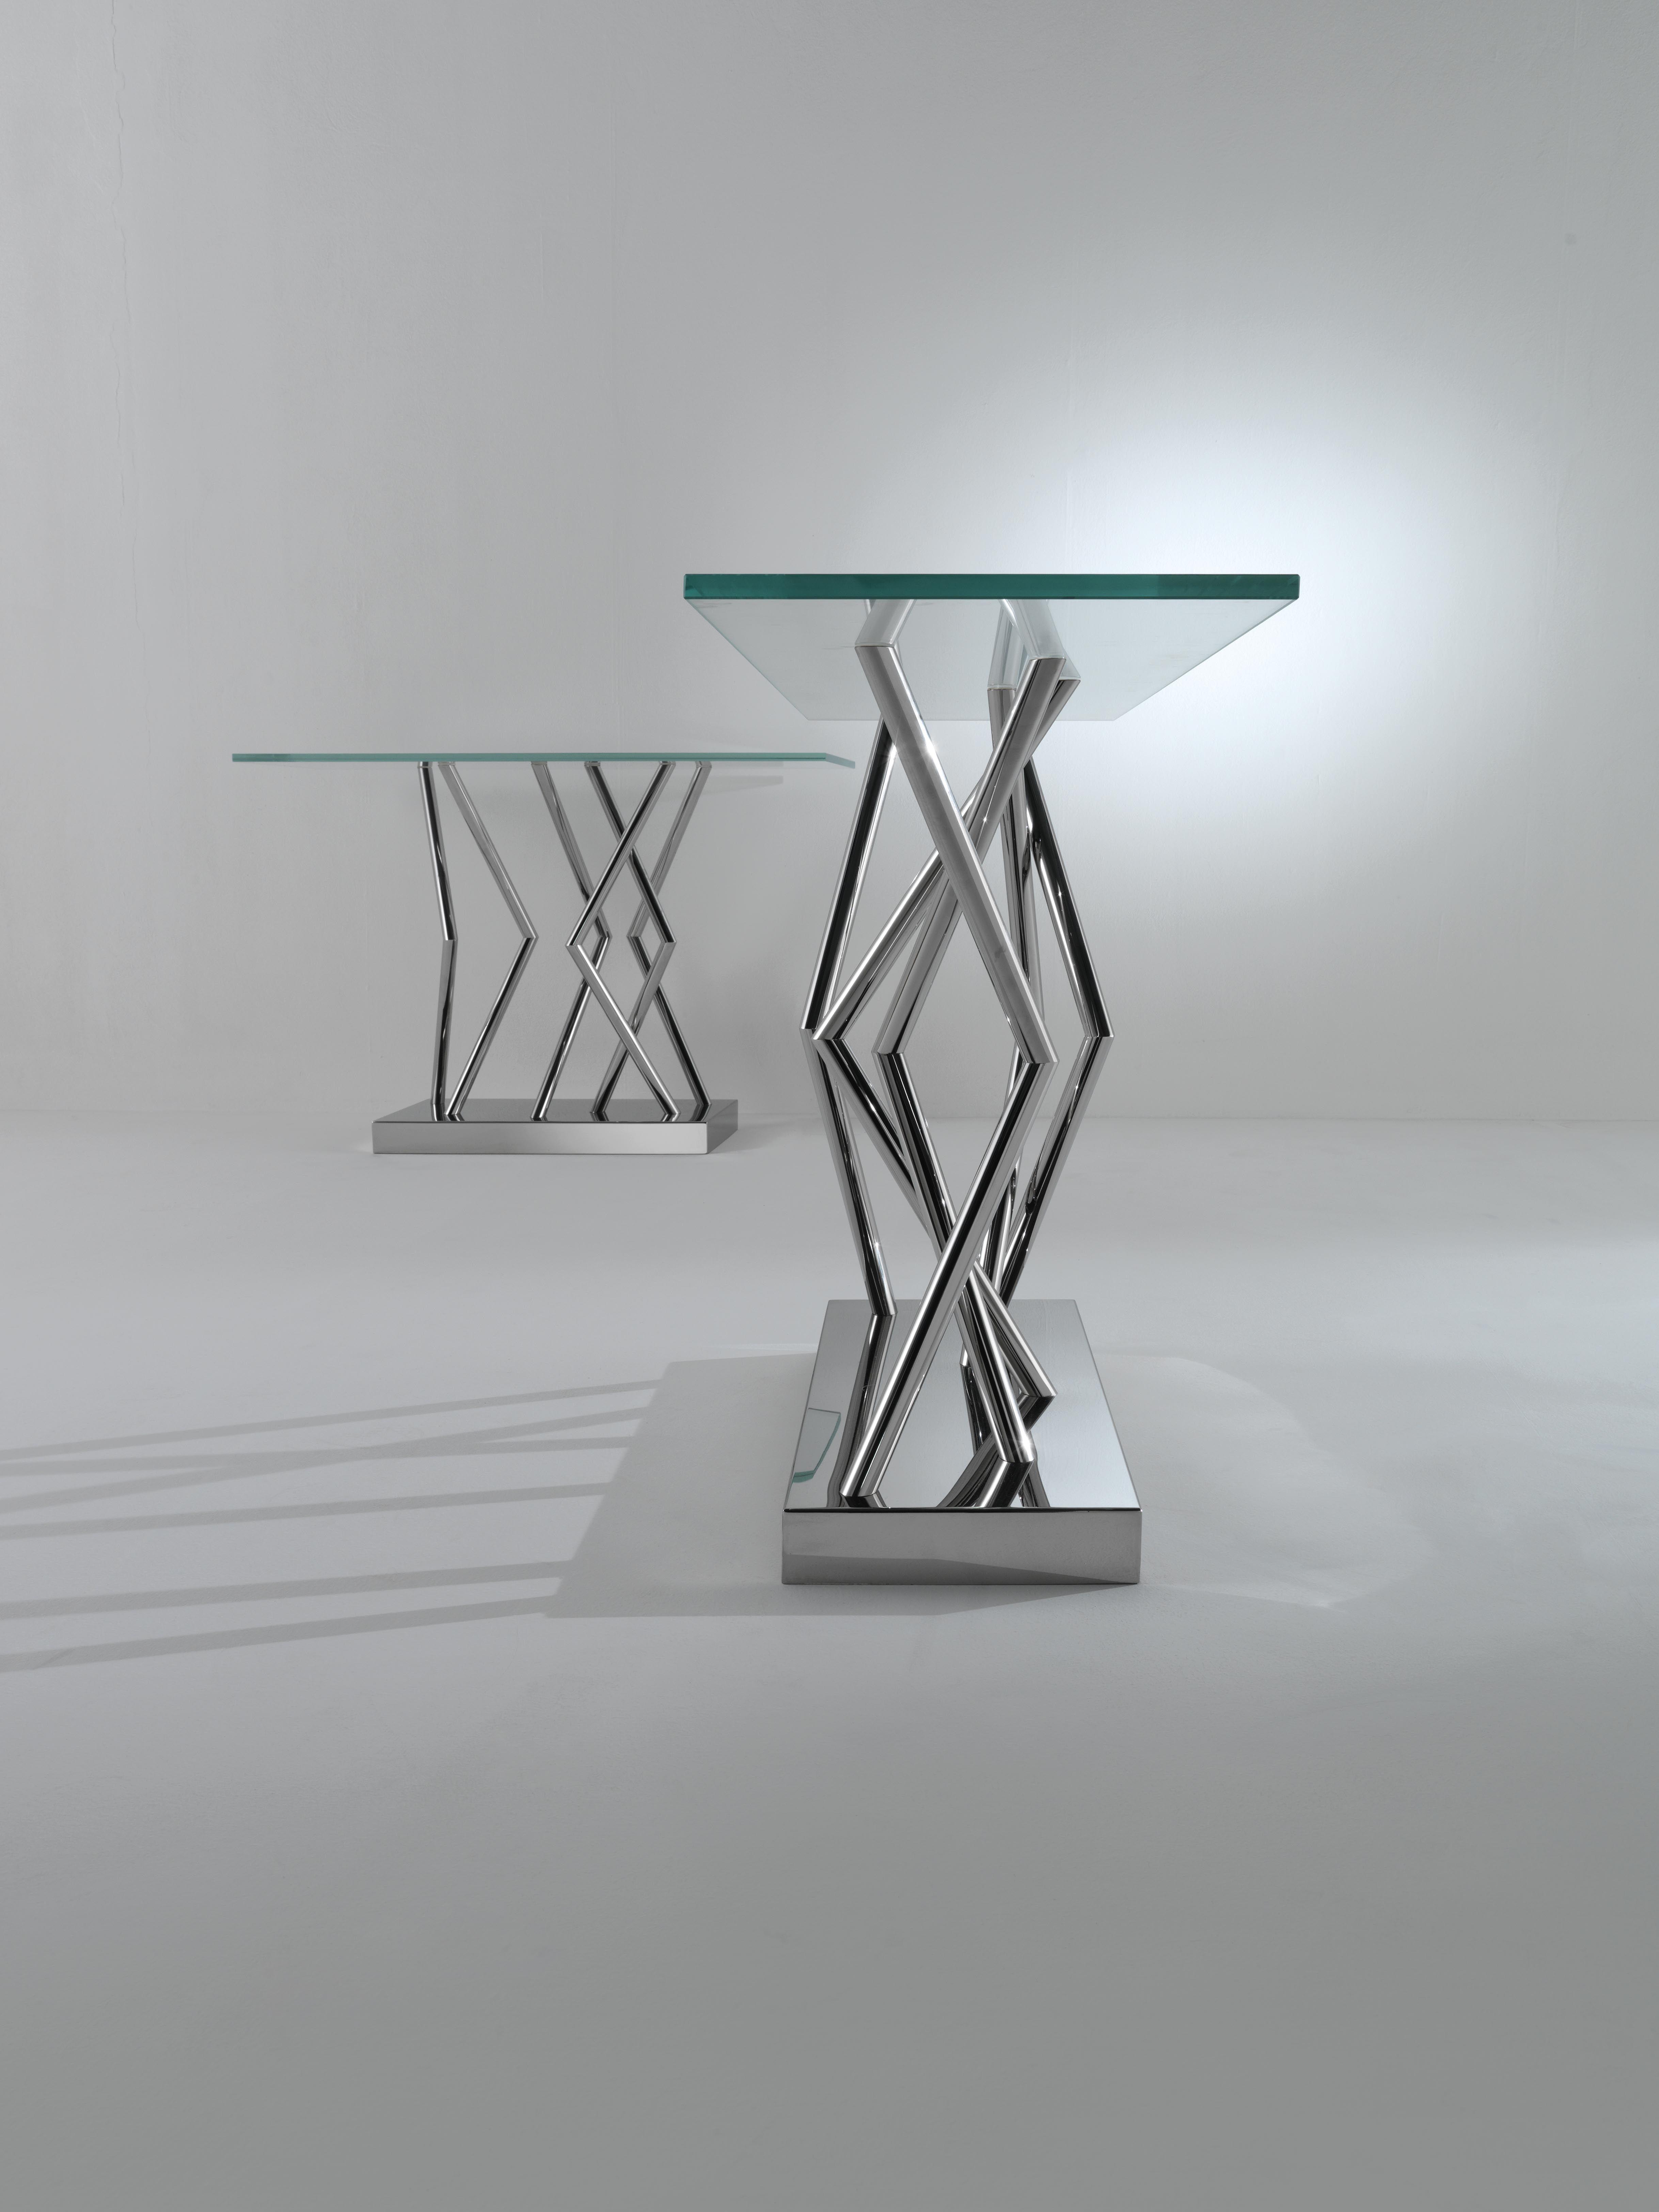 360d00f36b6830fdee8a2b66ab7ad404 Impressionnant De Tables Basses Roche Bobois Des Idées